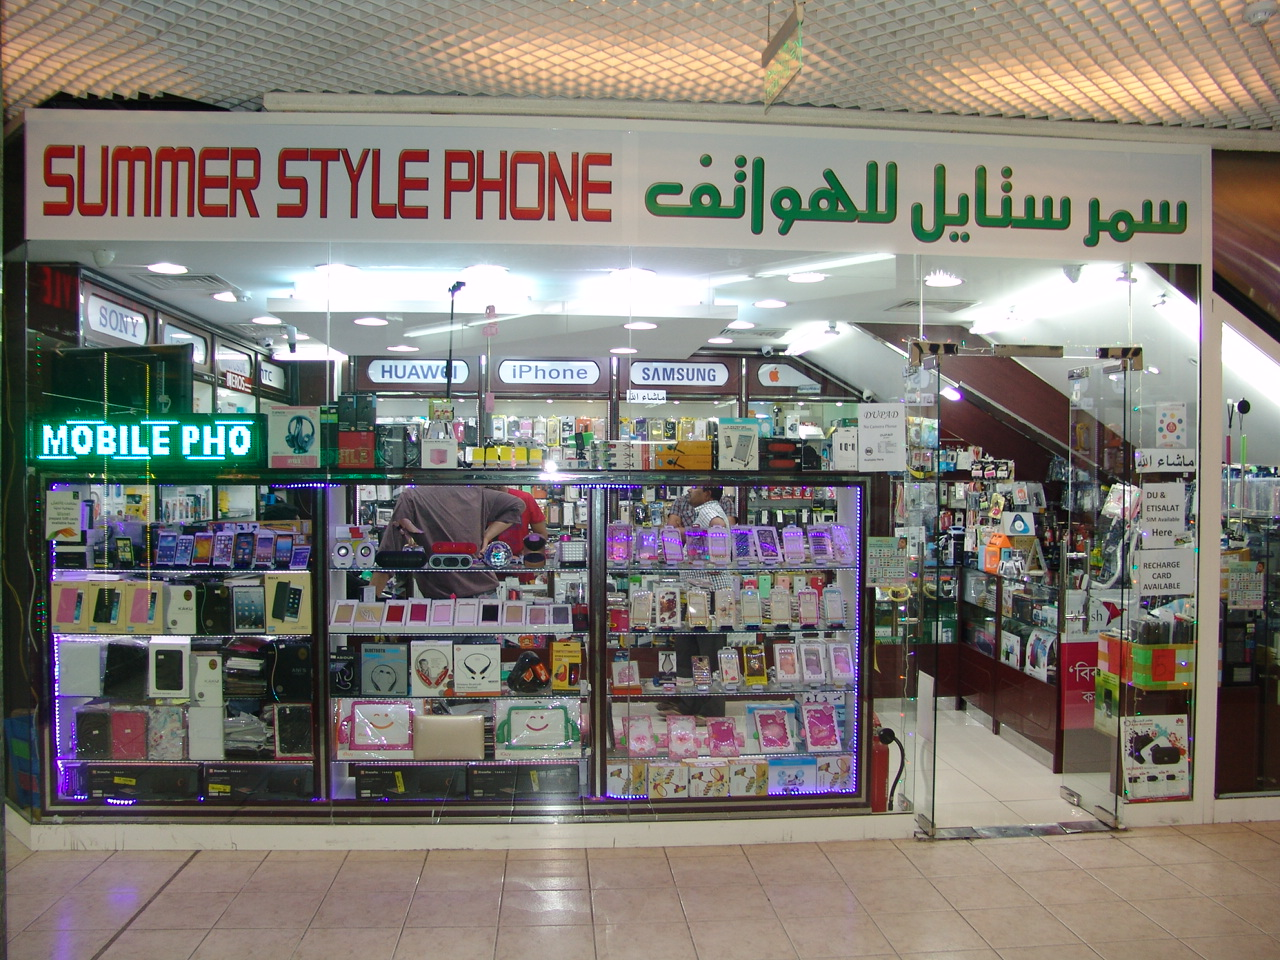 Summer Style phone - DSC00273.JPG